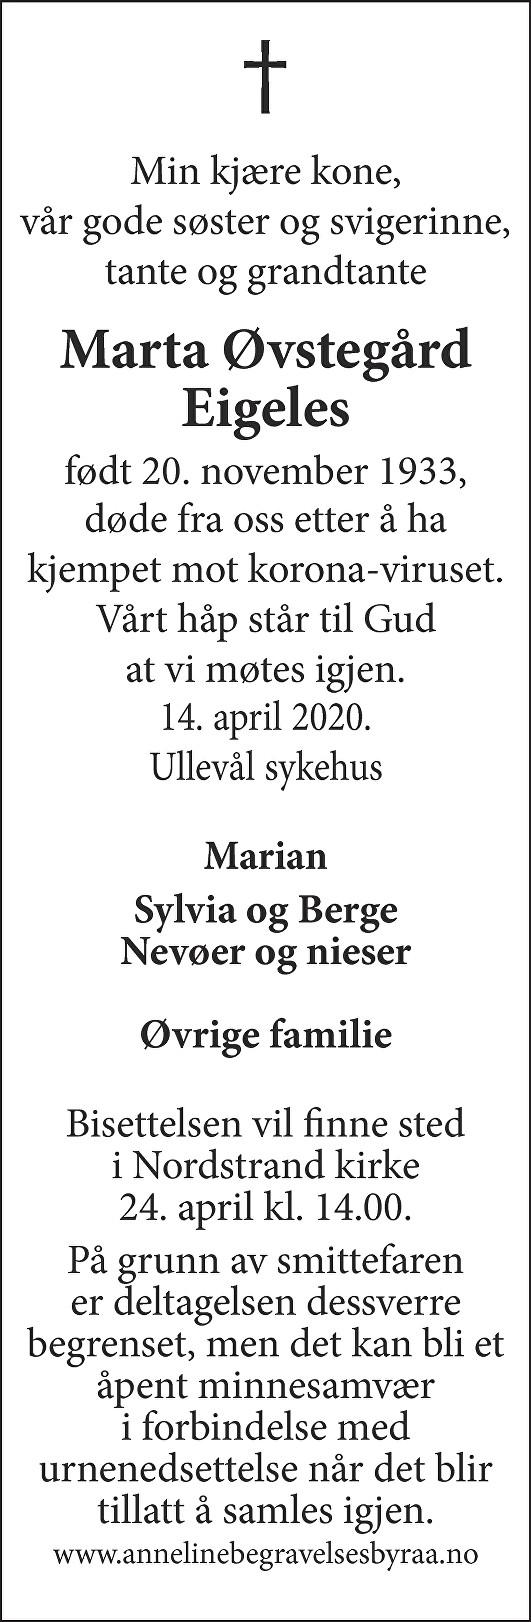 Marta Øvstegård Eigeles Dødsannonse